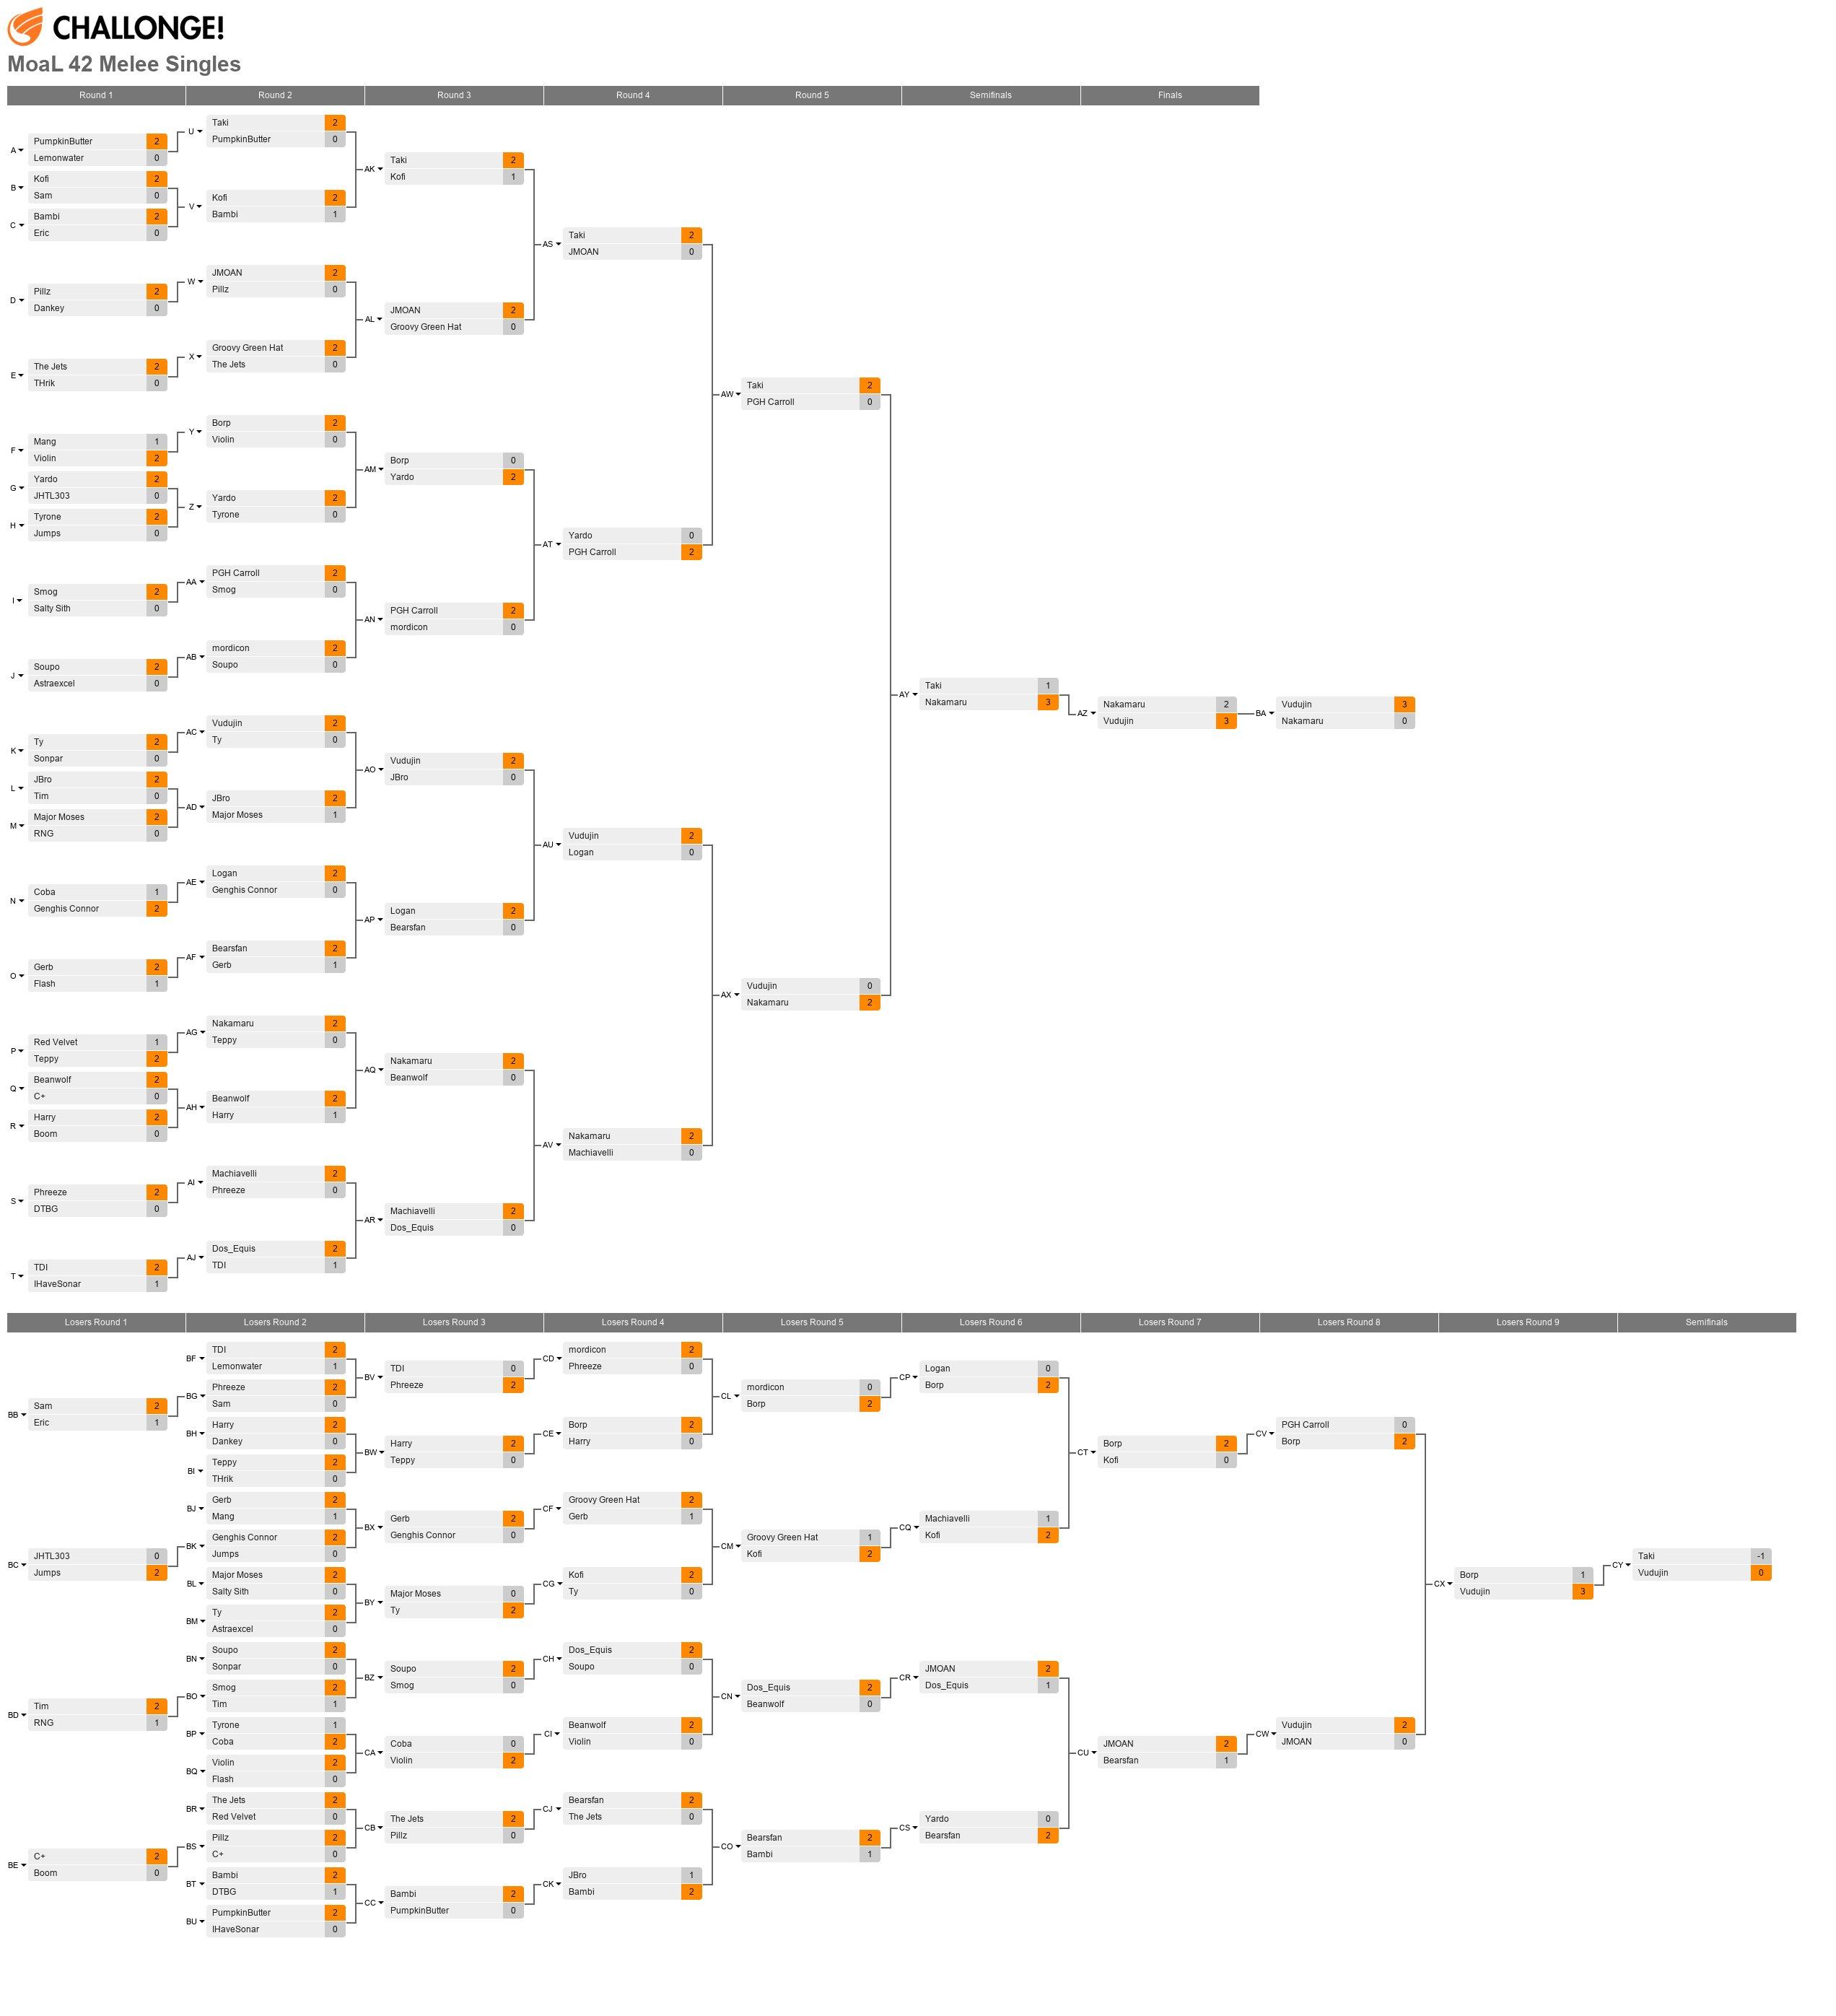 MoaL 42 Melee Singles (02.20.15)